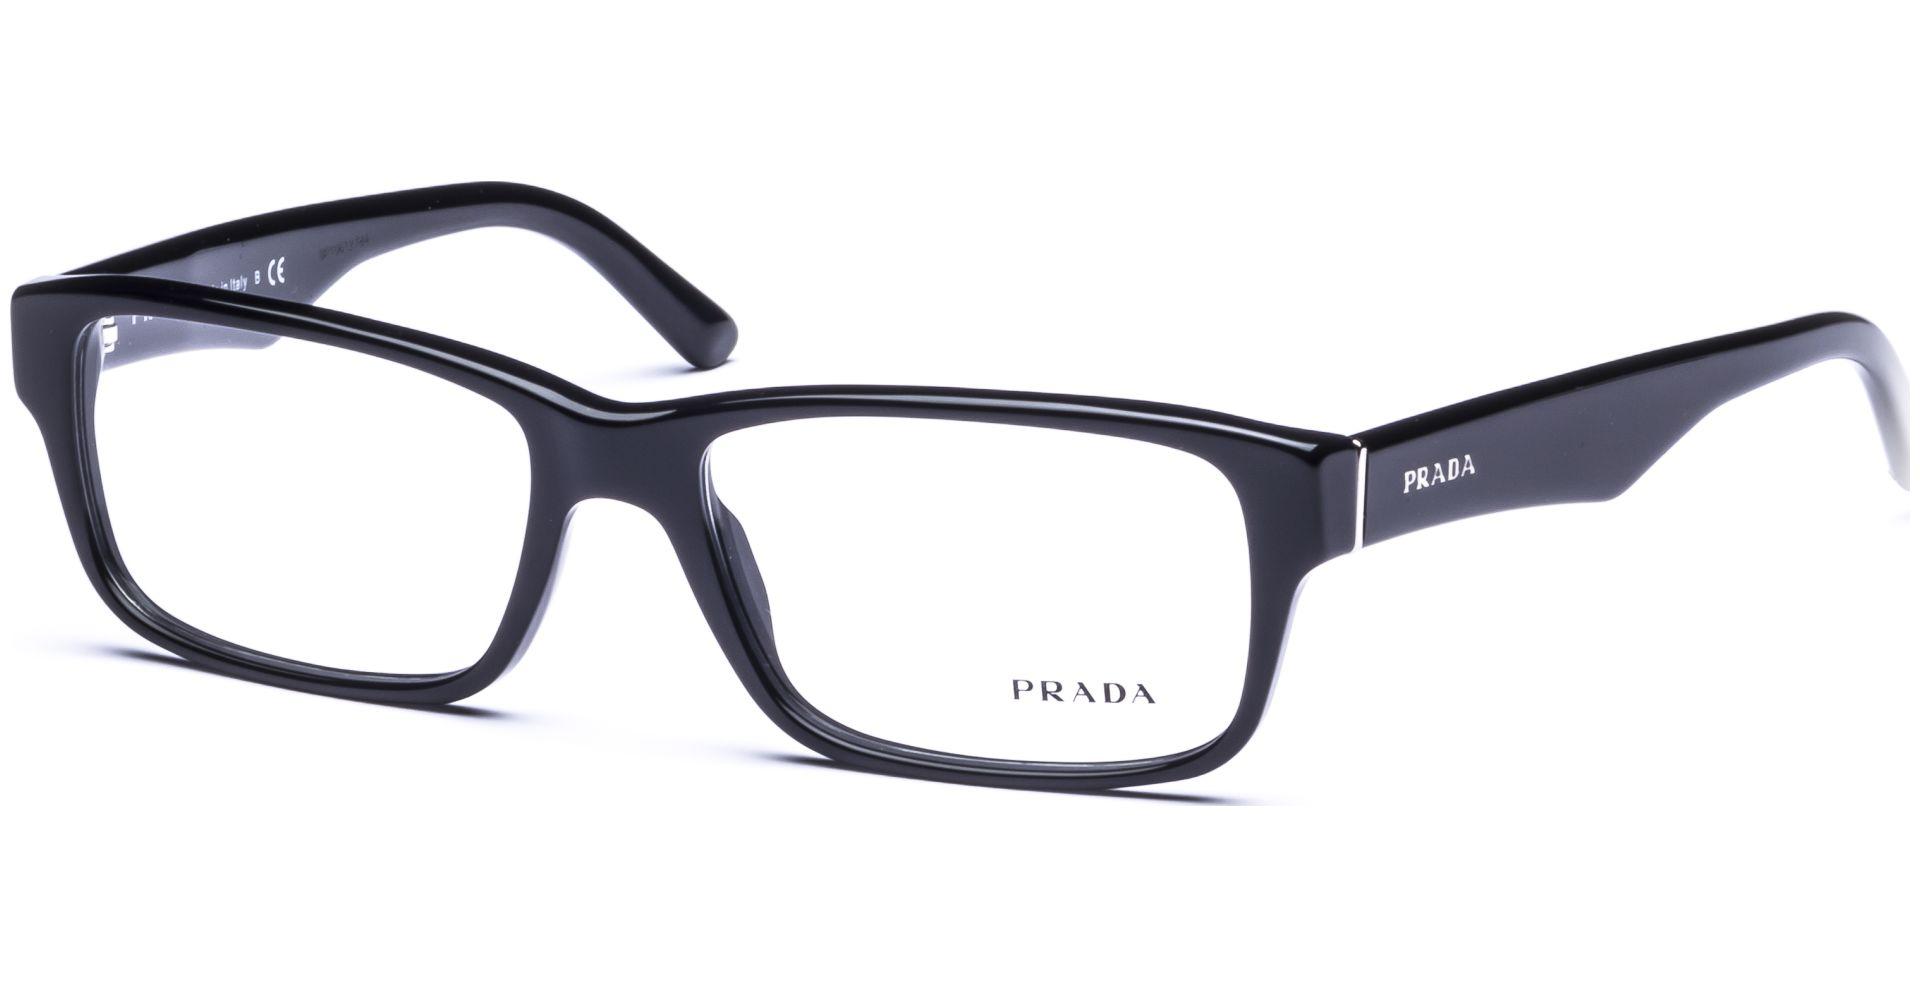 Prada - PR16MV 1AB101 5516 Gloss Black - von Lensbest